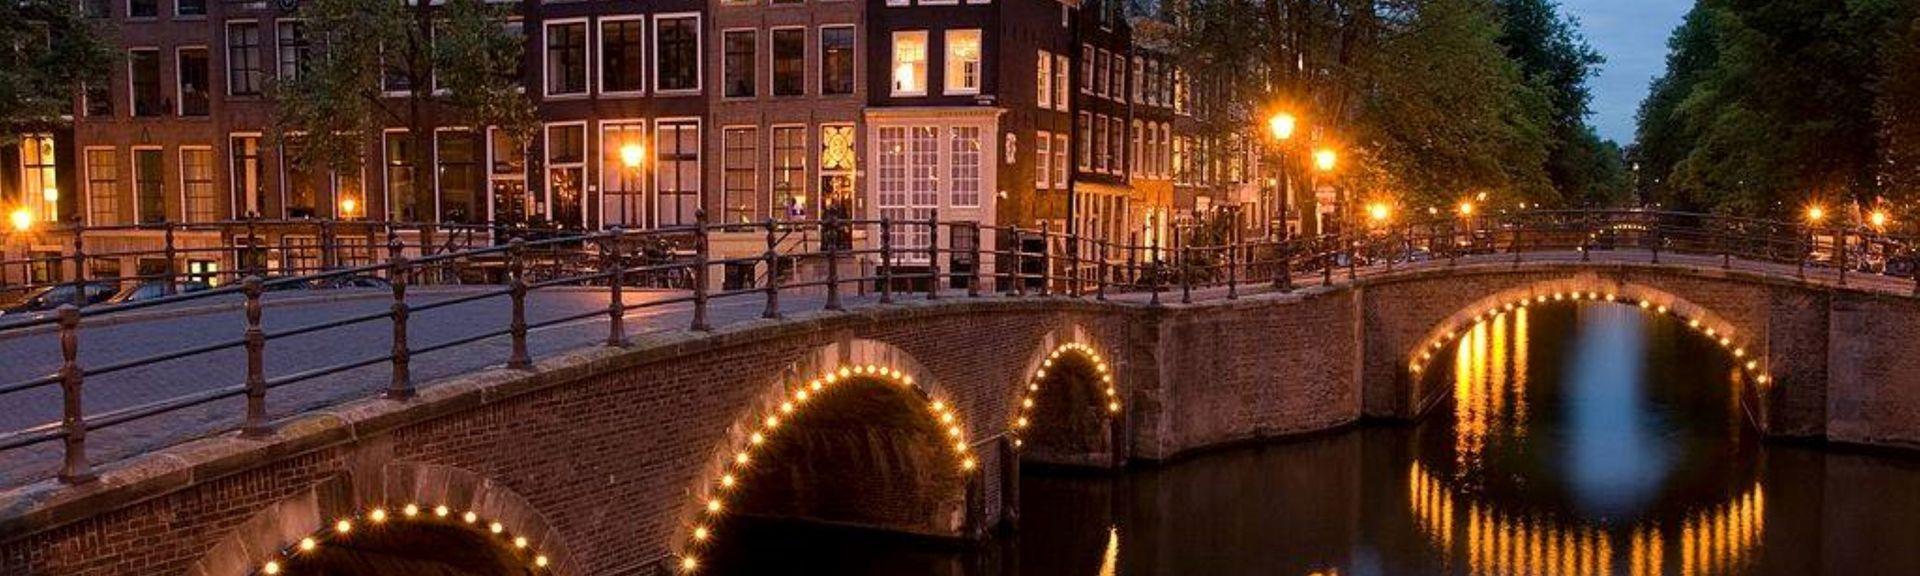 Gare d'Amsterdam Sloterdijk, Amsterdam, Hollande-Septentrionale, Pays-Bas